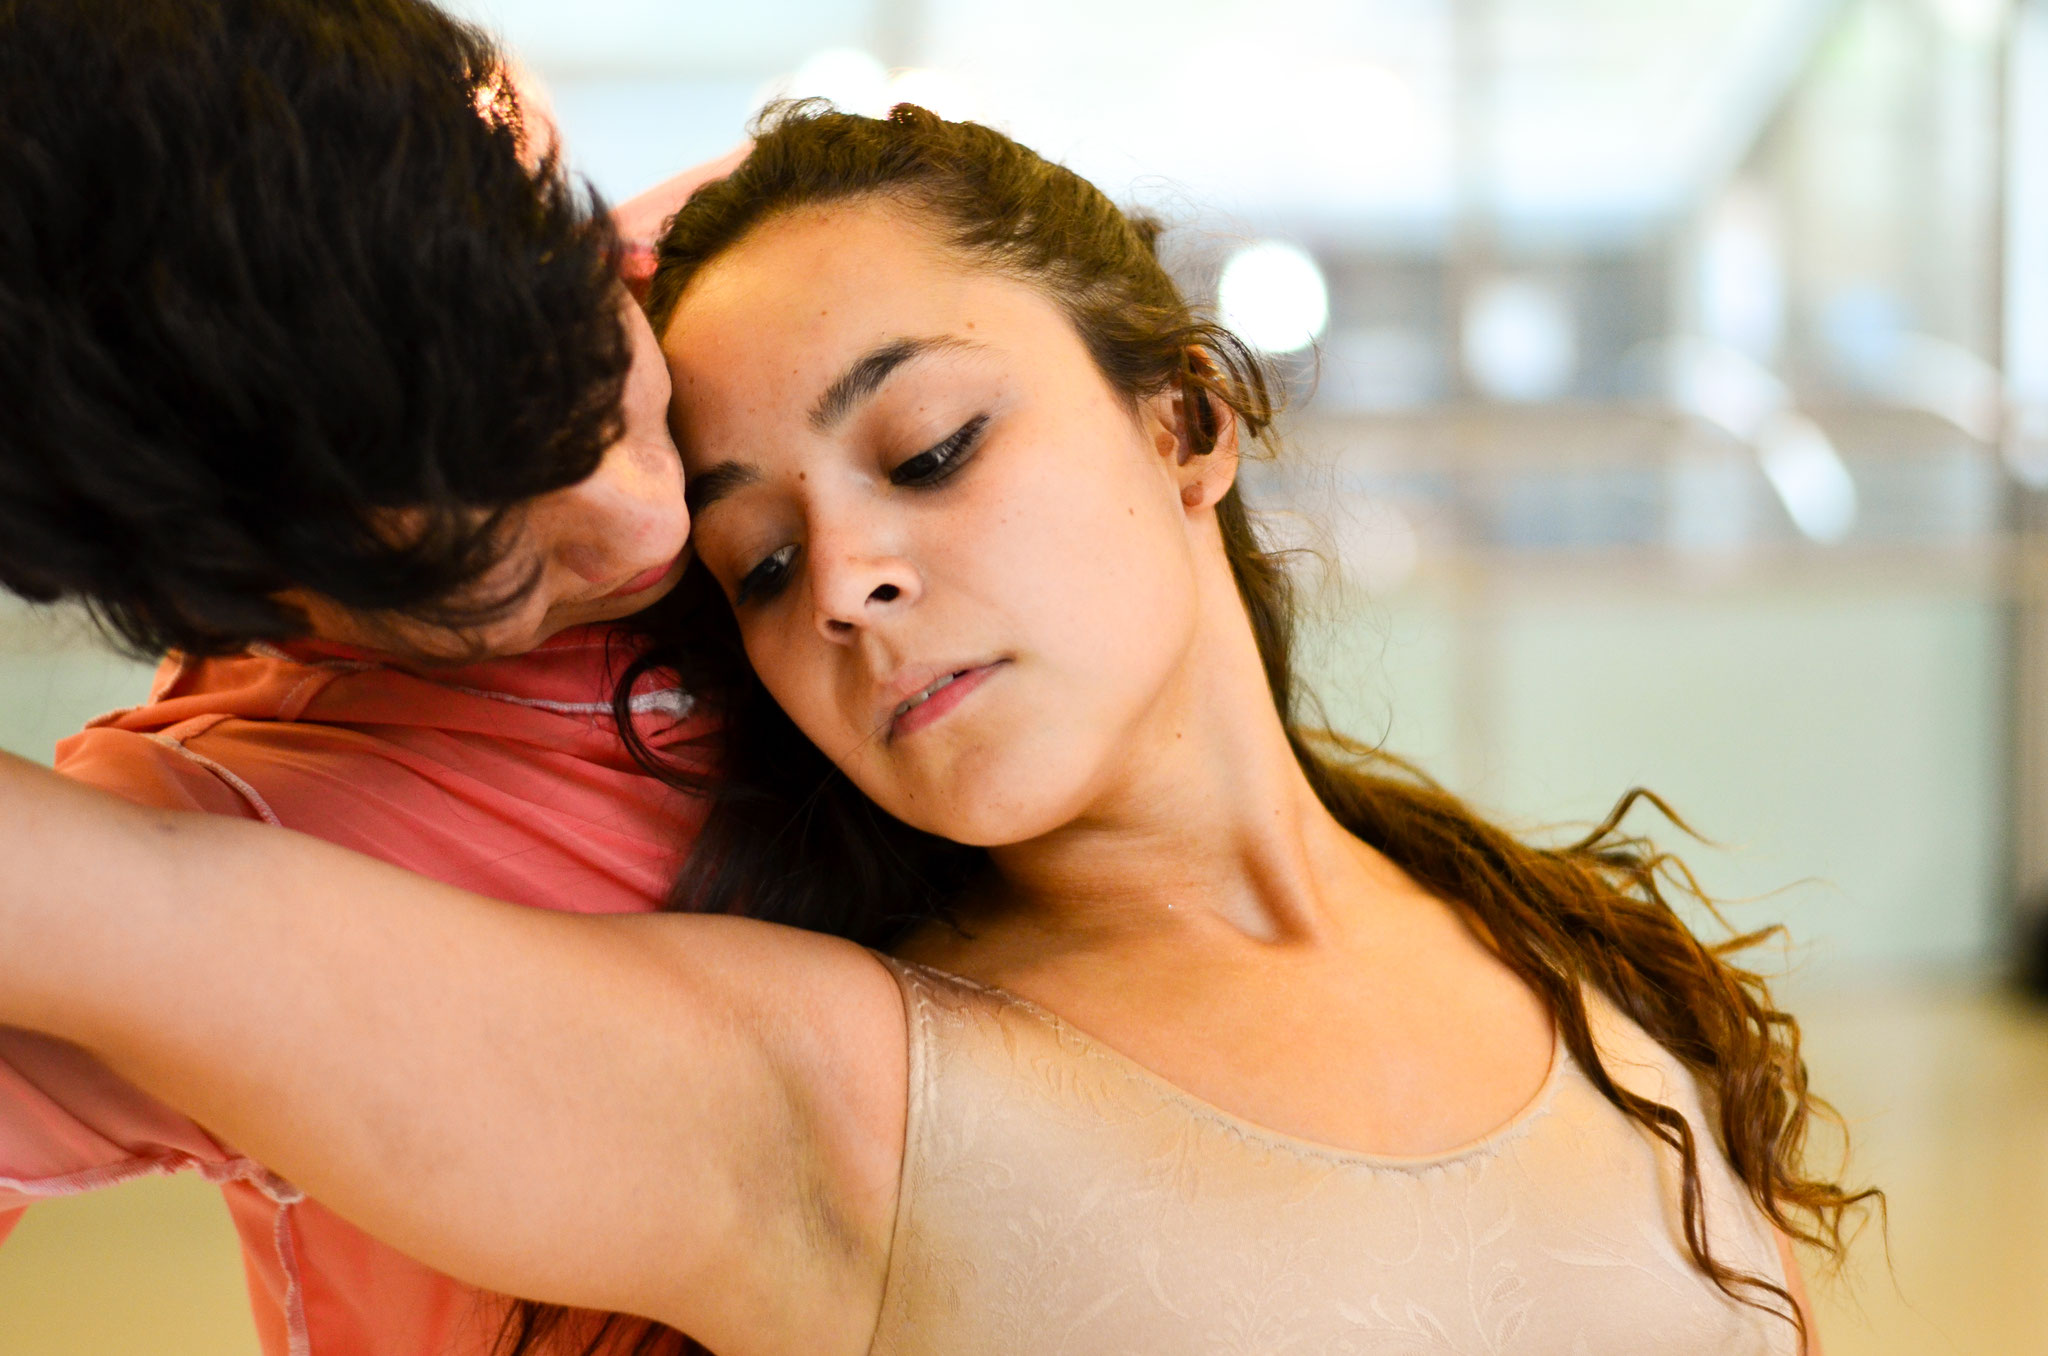 Amanda Torres (18) Cía. Mo-Mo dic, 2014 ensayo, Fotografía Vanessa Blasco